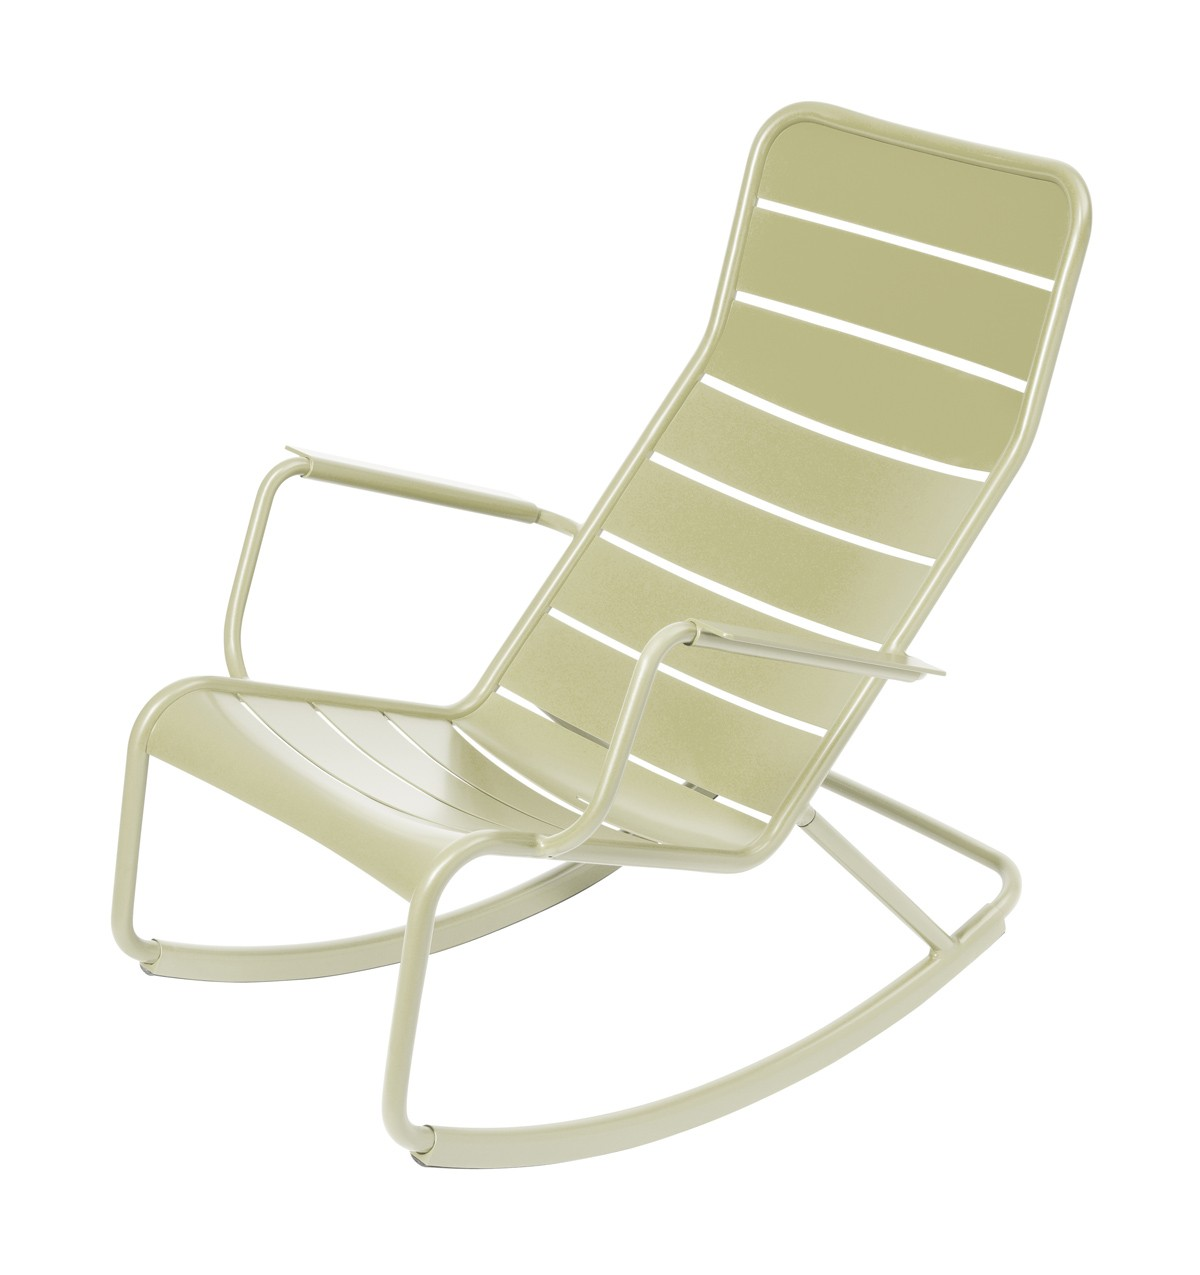 Rocking Chair LUXEMBOURG De Fermob Tilleul